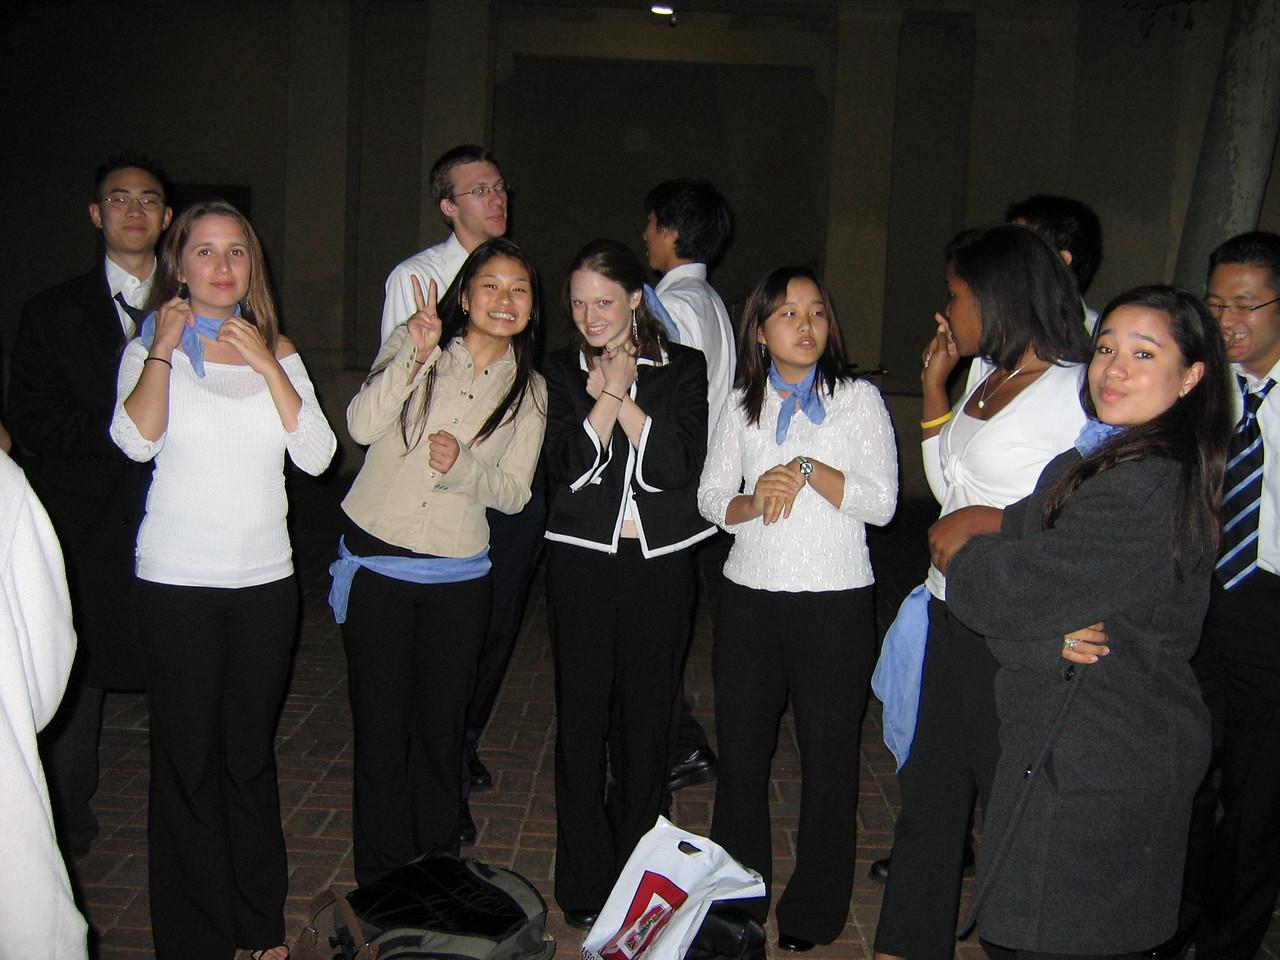 2005 10 22 Sat - Group pic outside Mem Aud 2